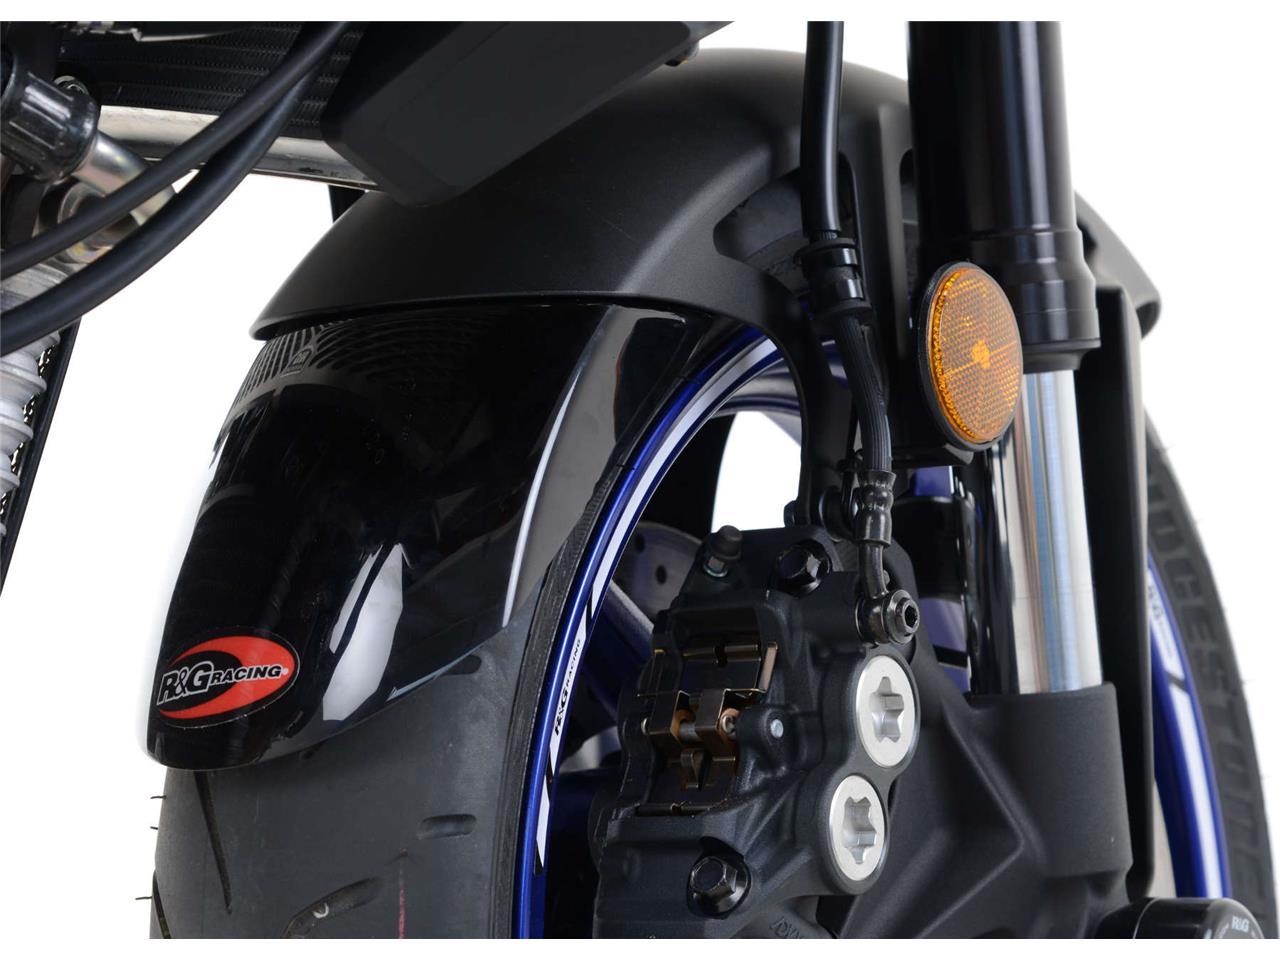 extension garde boue avant moto yamaha mt 10 rg racing ferg0008bk. Black Bedroom Furniture Sets. Home Design Ideas